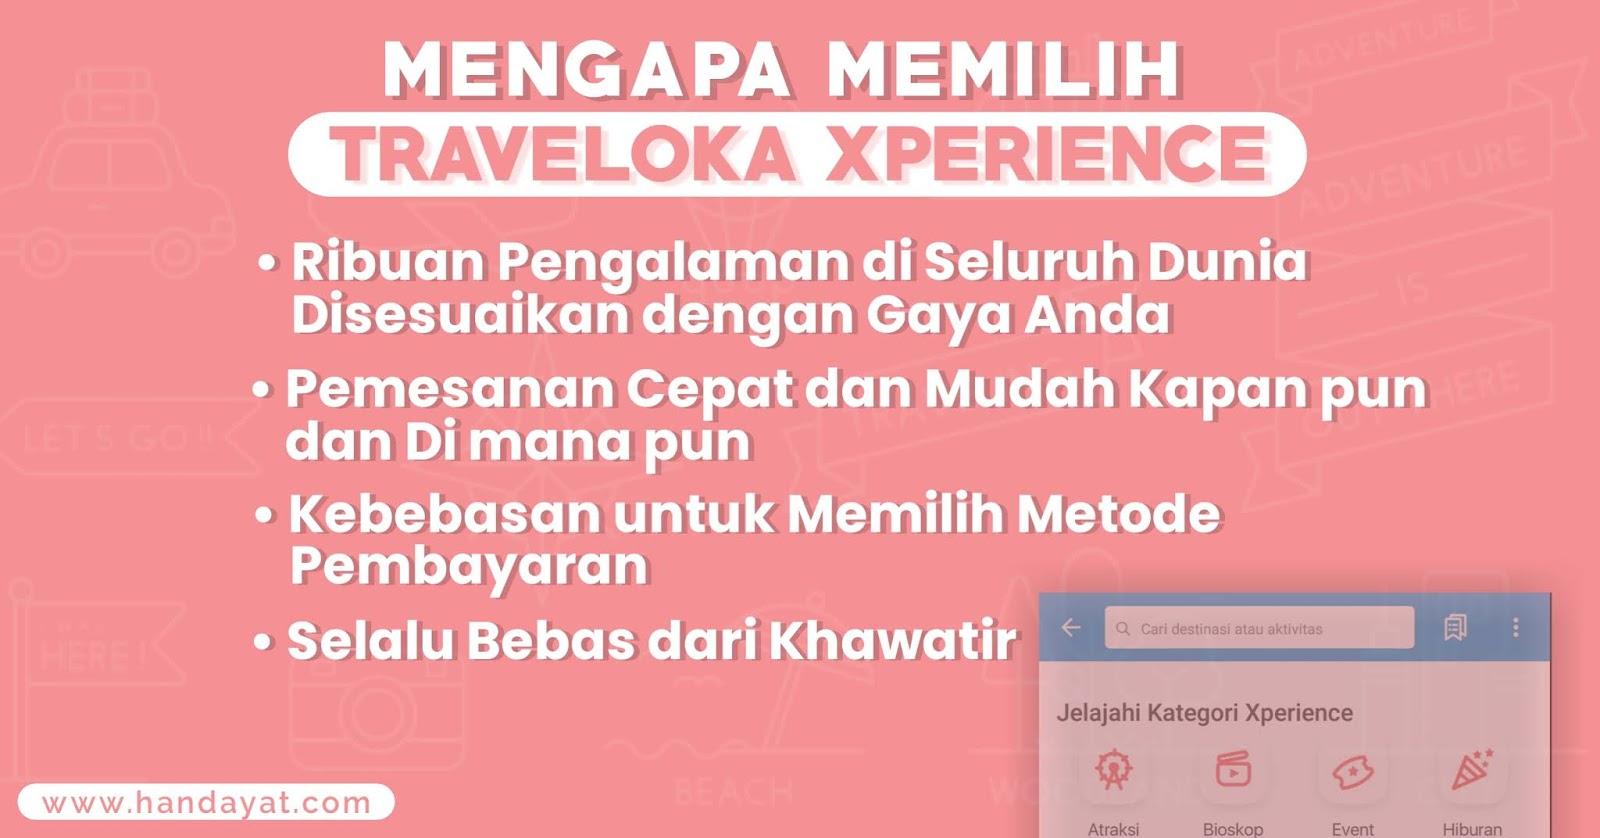 Alasan Memilih Traveloka Xperience